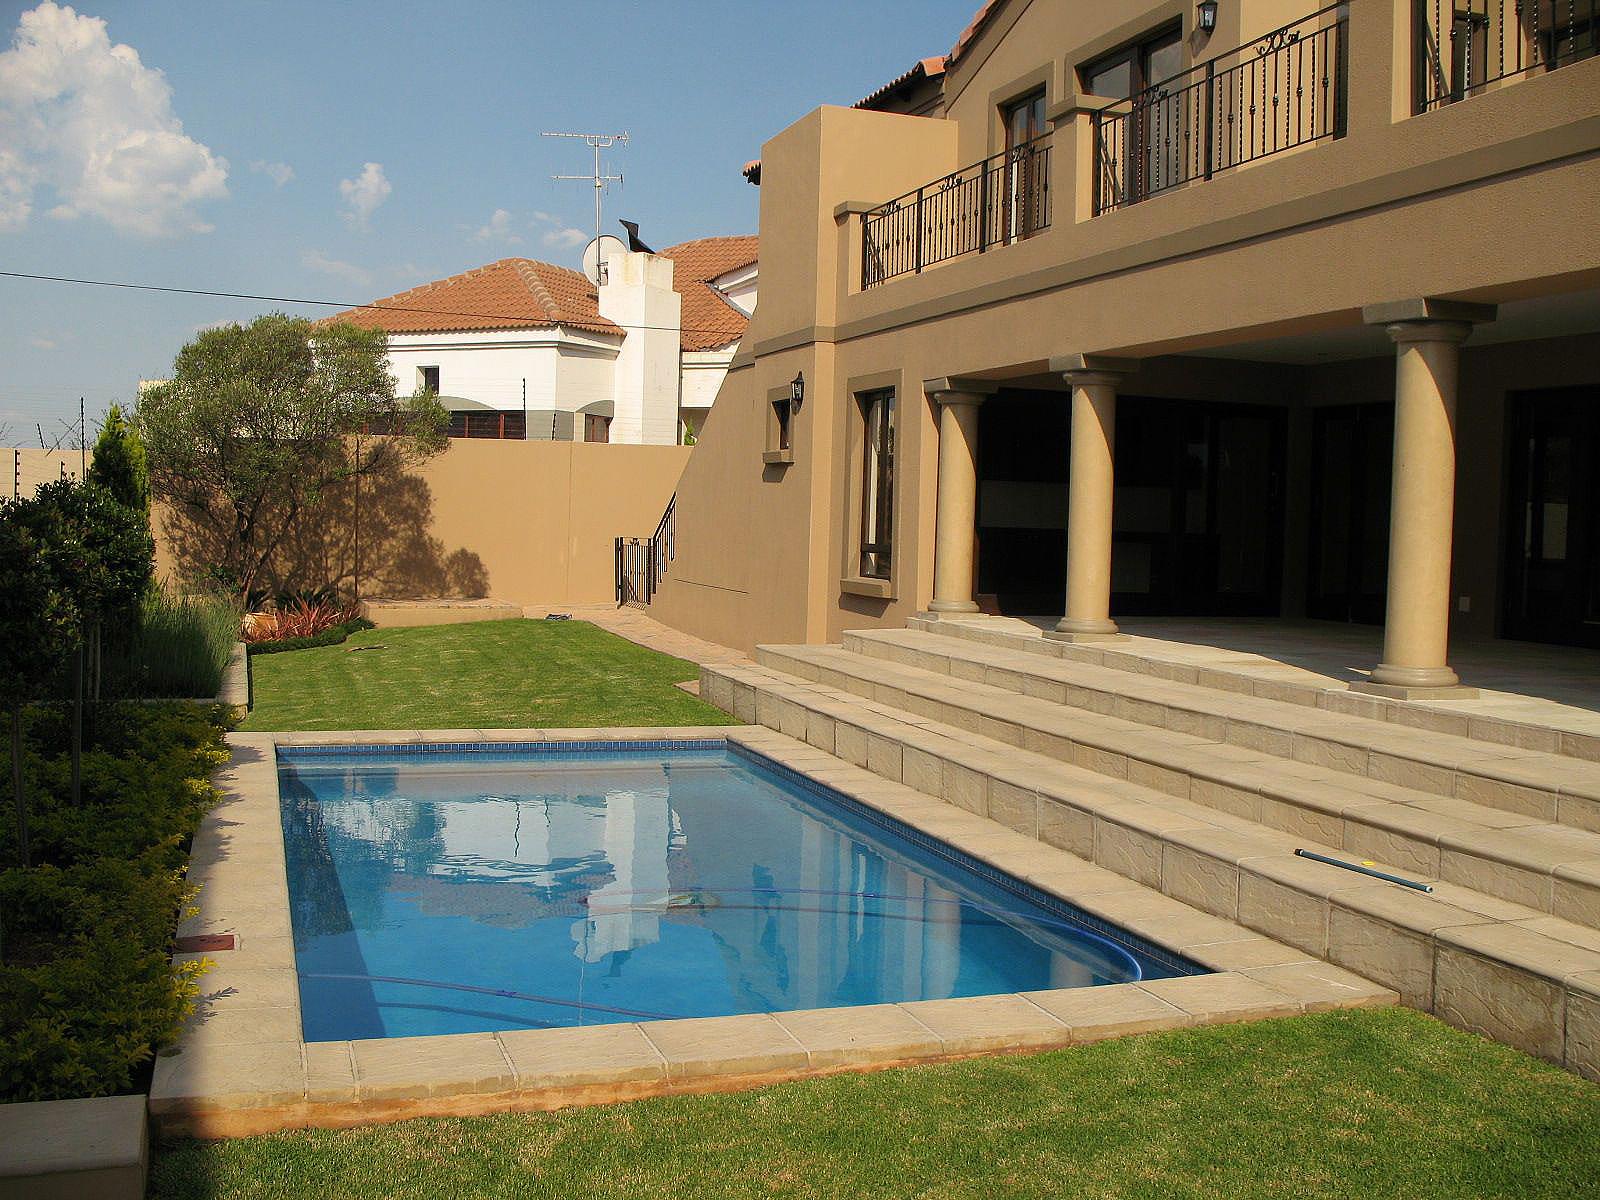 Zwembad achtergronden hd wallpapers for Pool designs victoria